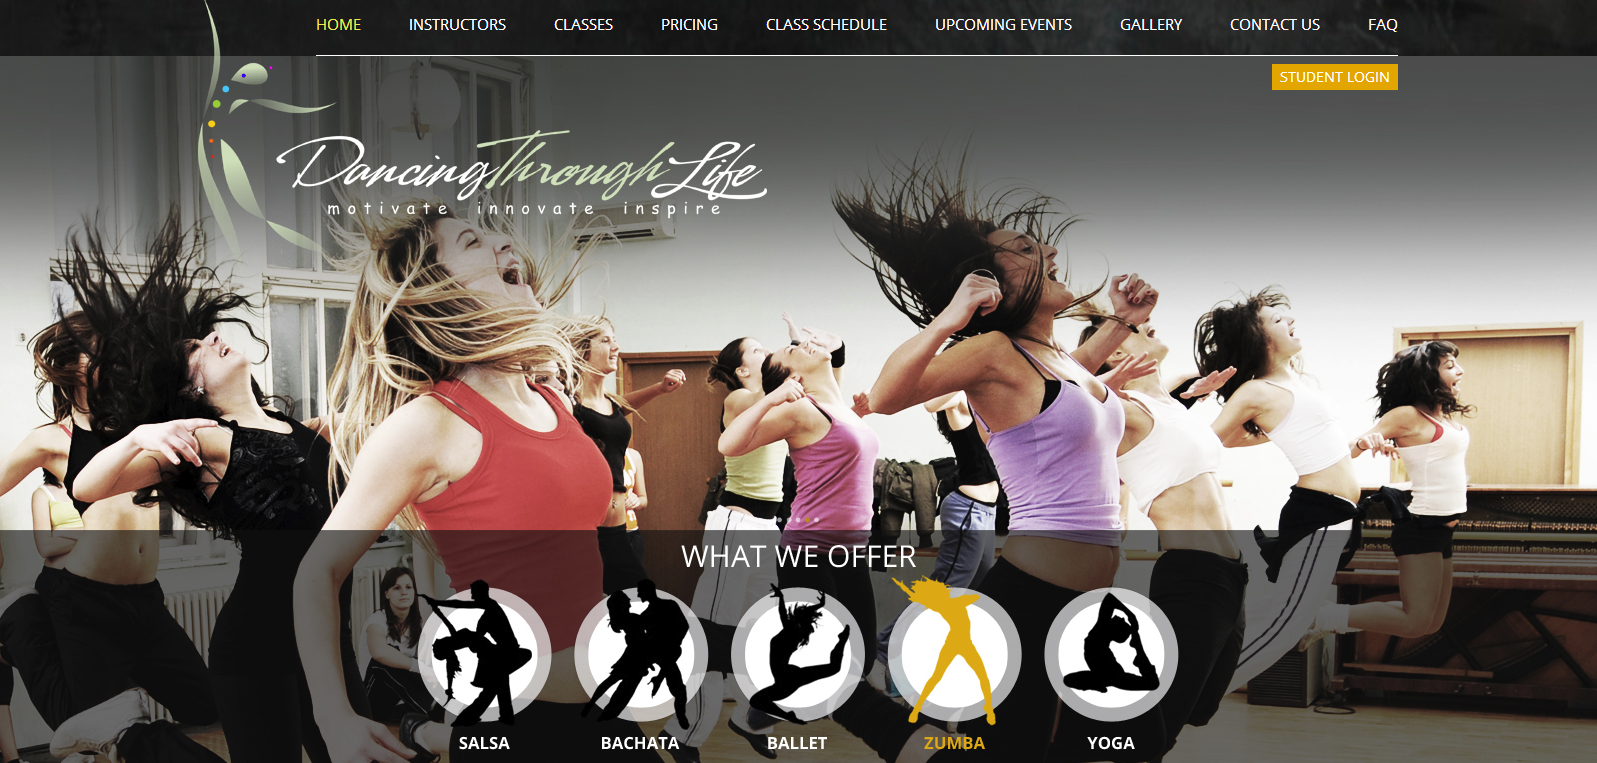 website-design-dancing-studio-creative-webdesign-miami-beach ...